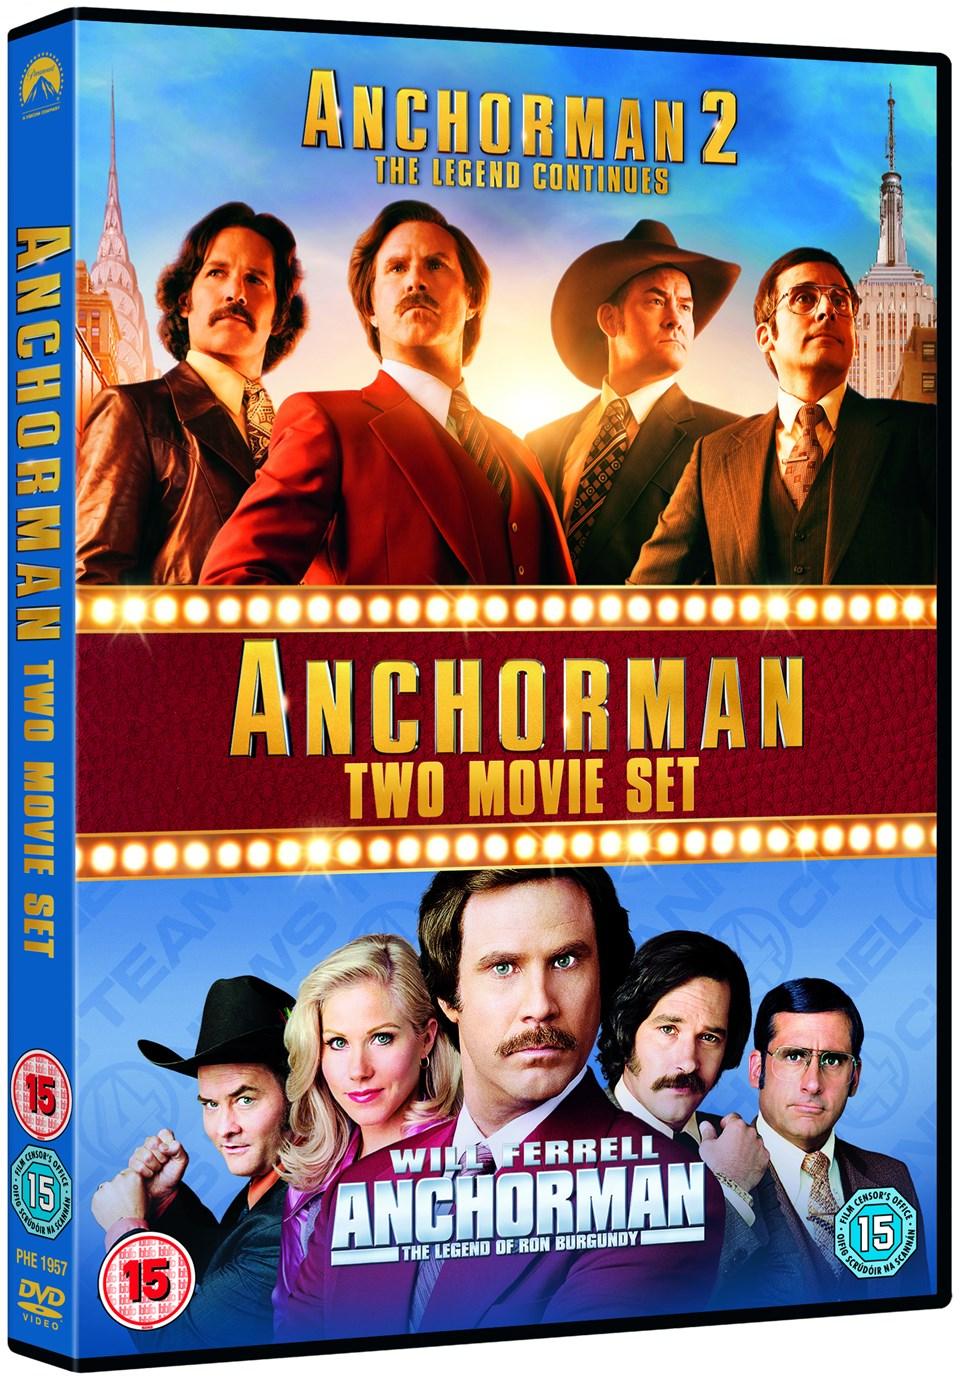 Anchorman/Anchorman 2 - 1